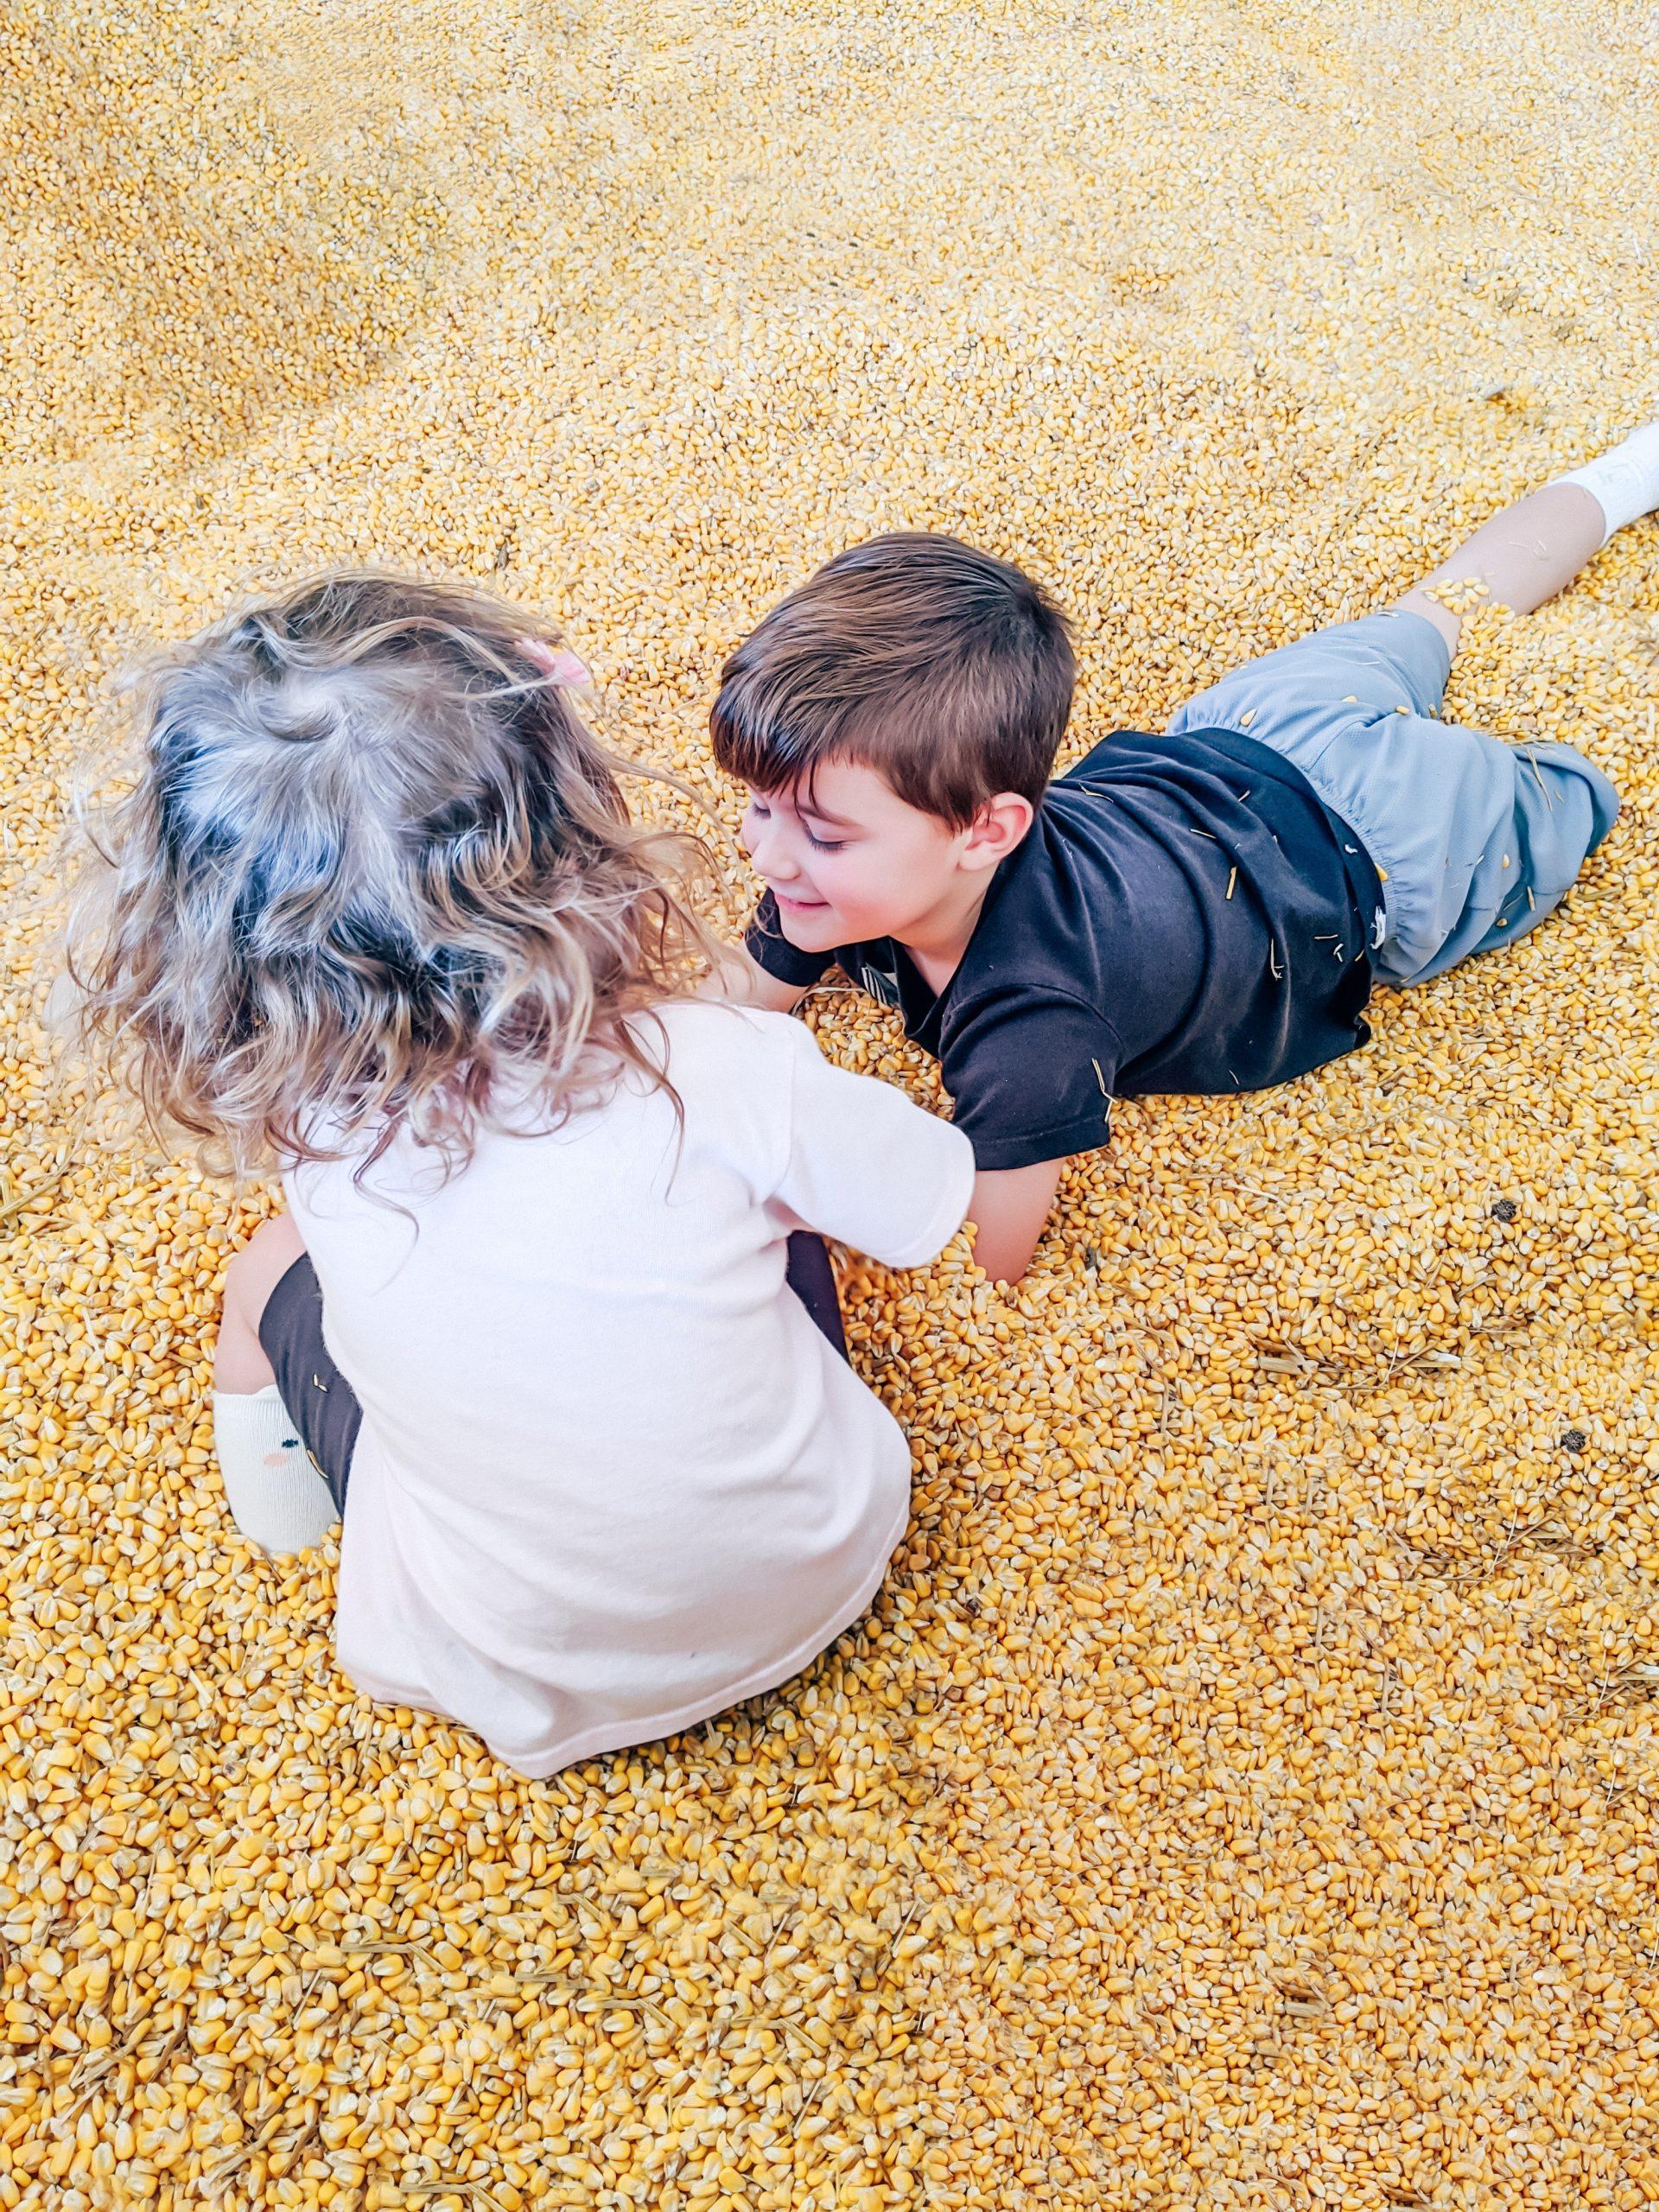 Fun Farm Pumpkin Patch Kearney MO Reviews - Fun Farm Kearney Missouri - Fun Farm Reviews Kearney - Pumpkin Patch Kansas City - Best Pumpkin Patch in Kansas City - Missouri Pumpkin Patches - A detailed review of Fun Farm Pumpkin Patch in Kearney, MO with lots of photos! #kearney #funfarm #pumpkinpatch #pumpkinpatches #kansascity